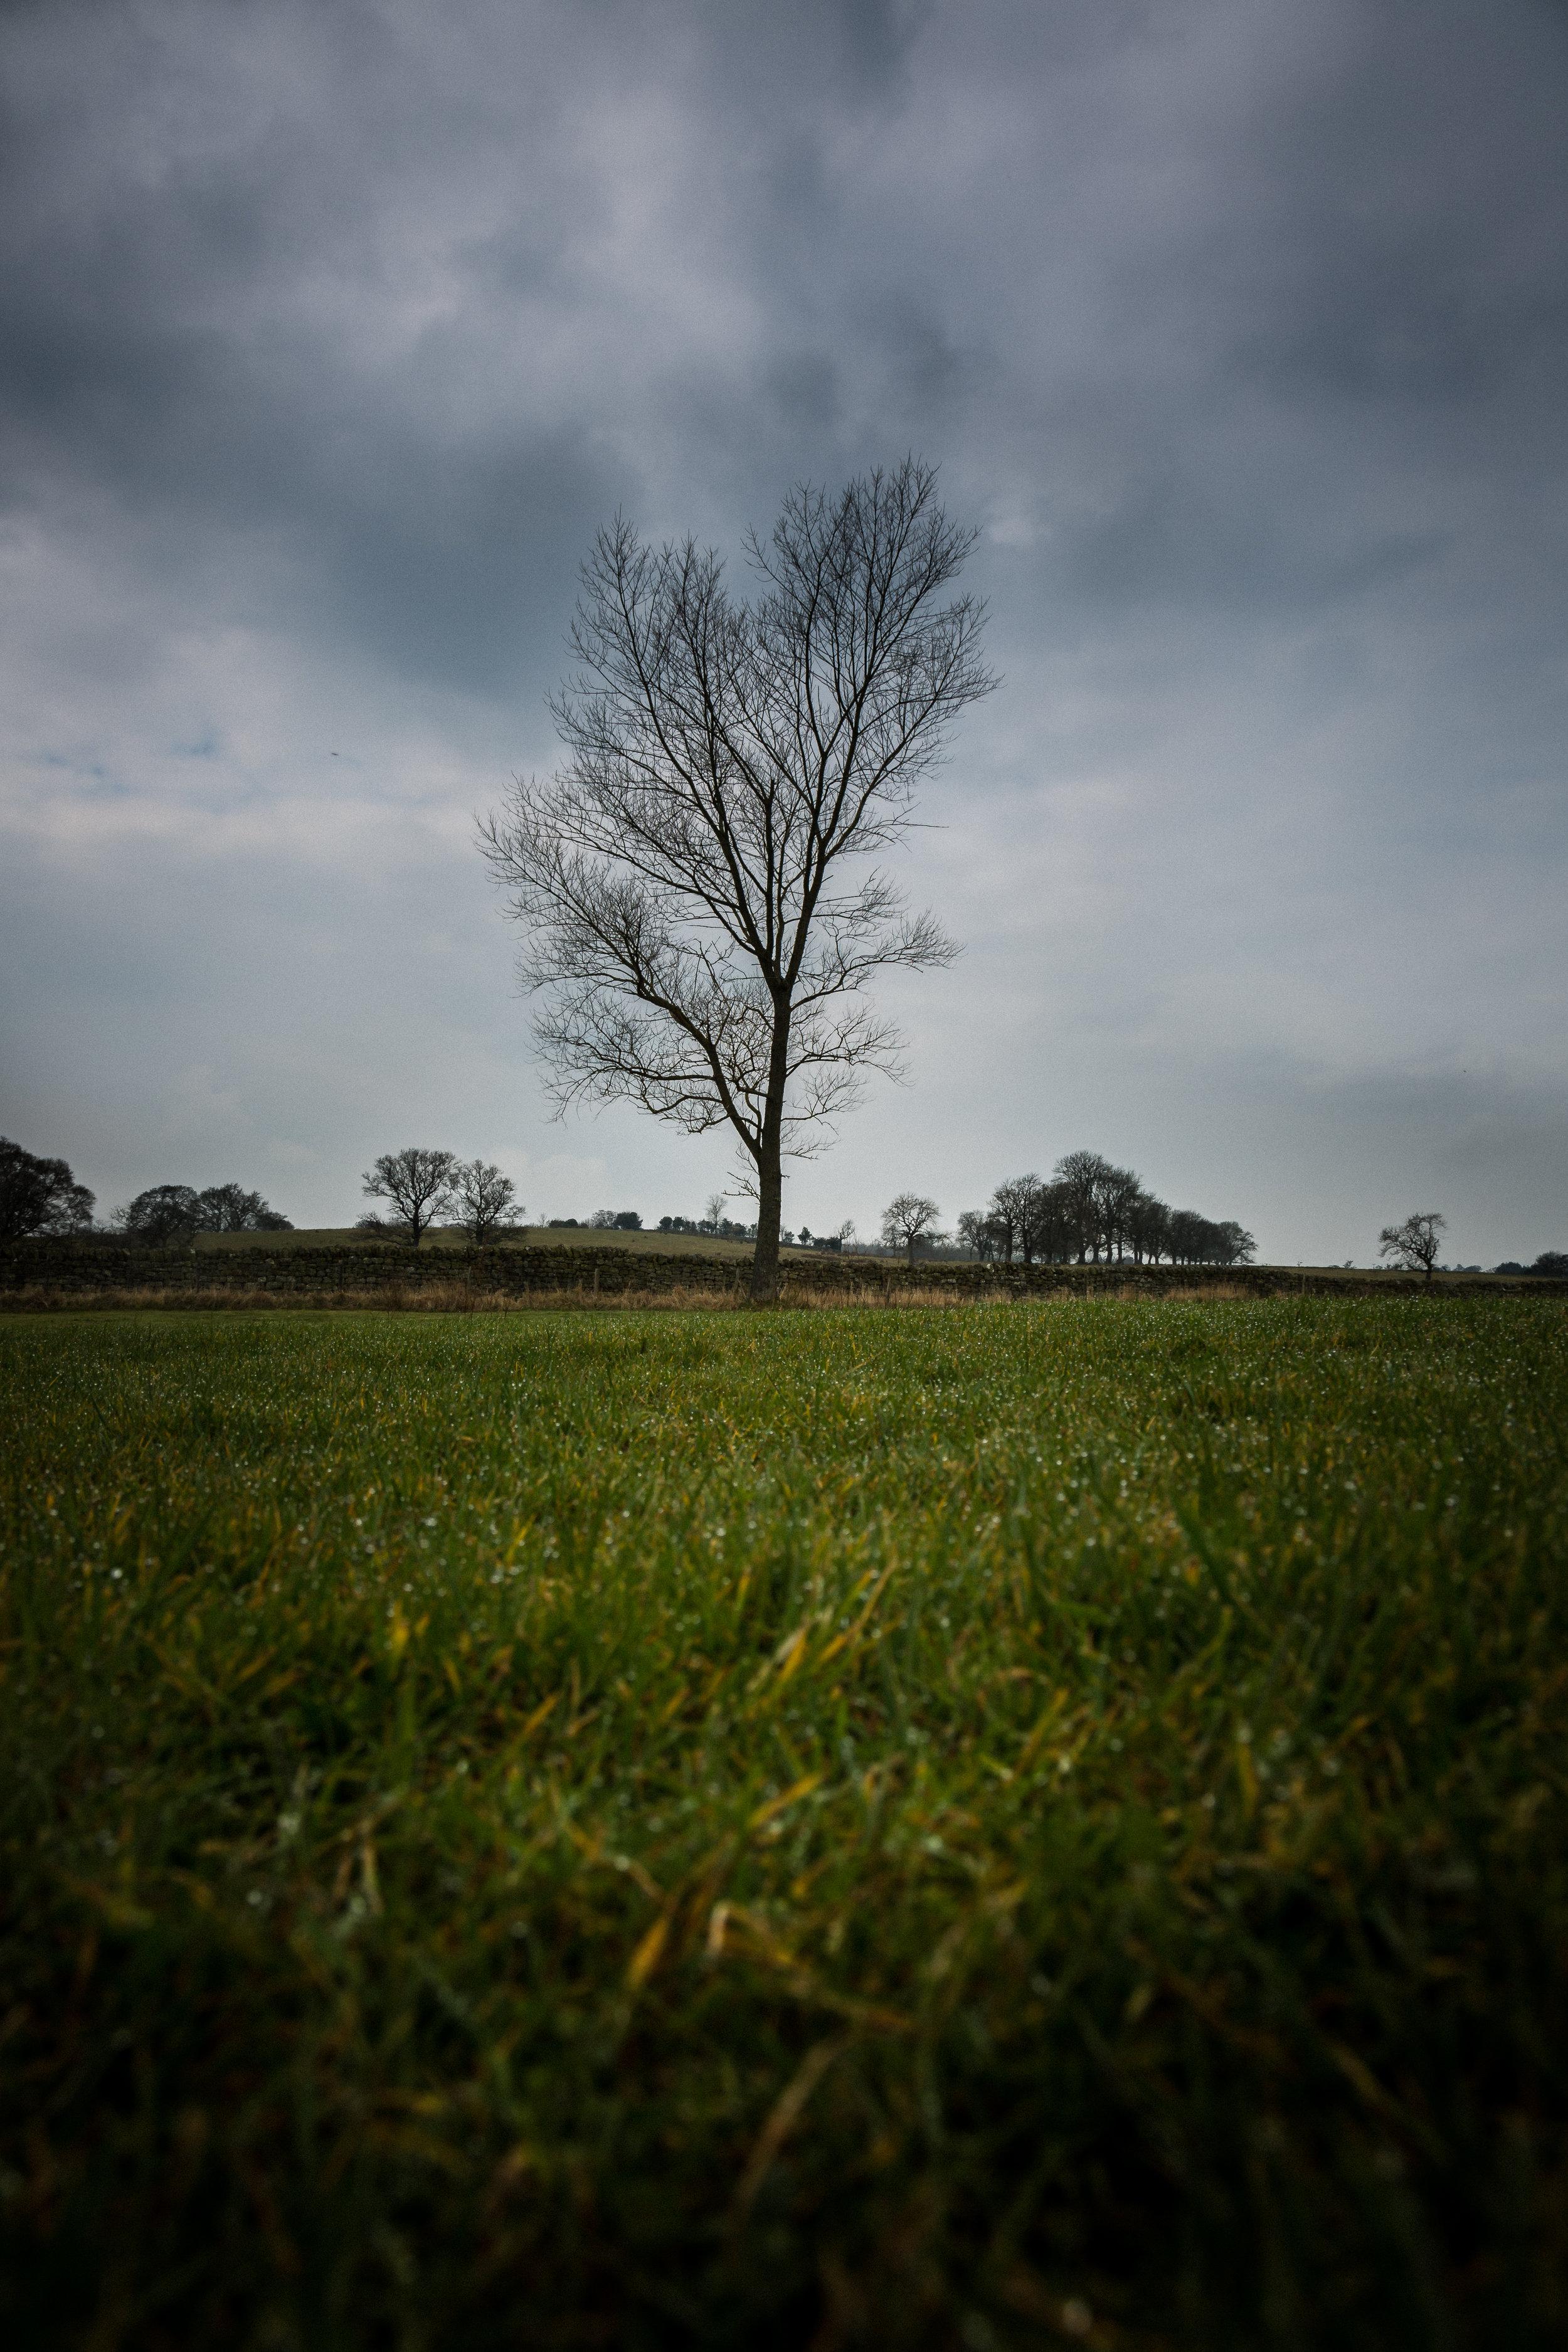 vindolanda tree (1 of 1).jpg